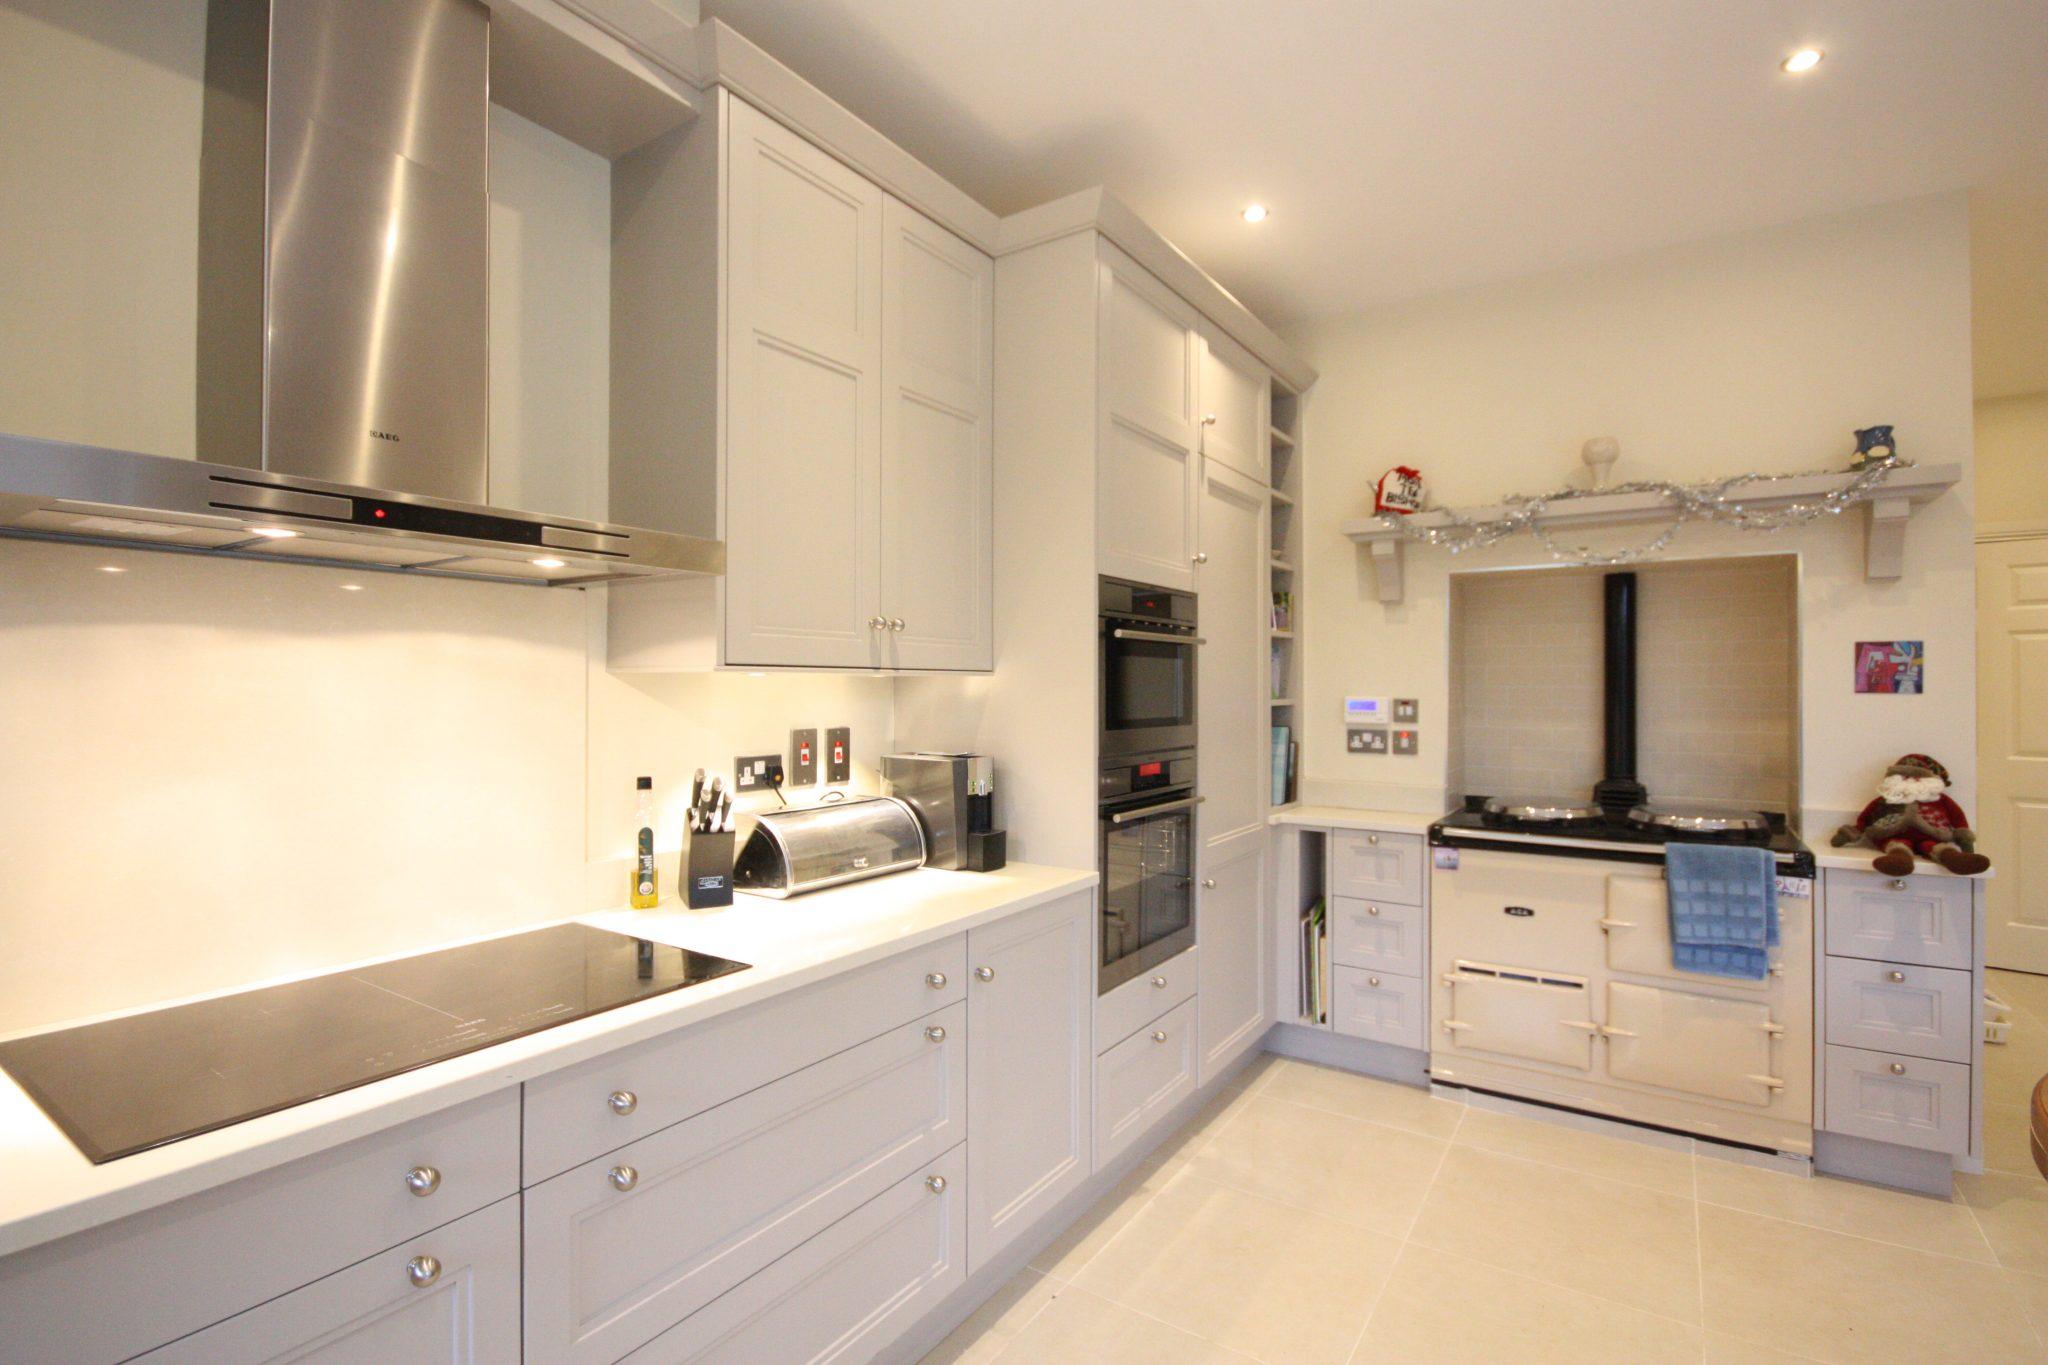 Enigma design stepped shaker bespoke kitchen design 5 for Kitchen design ireland